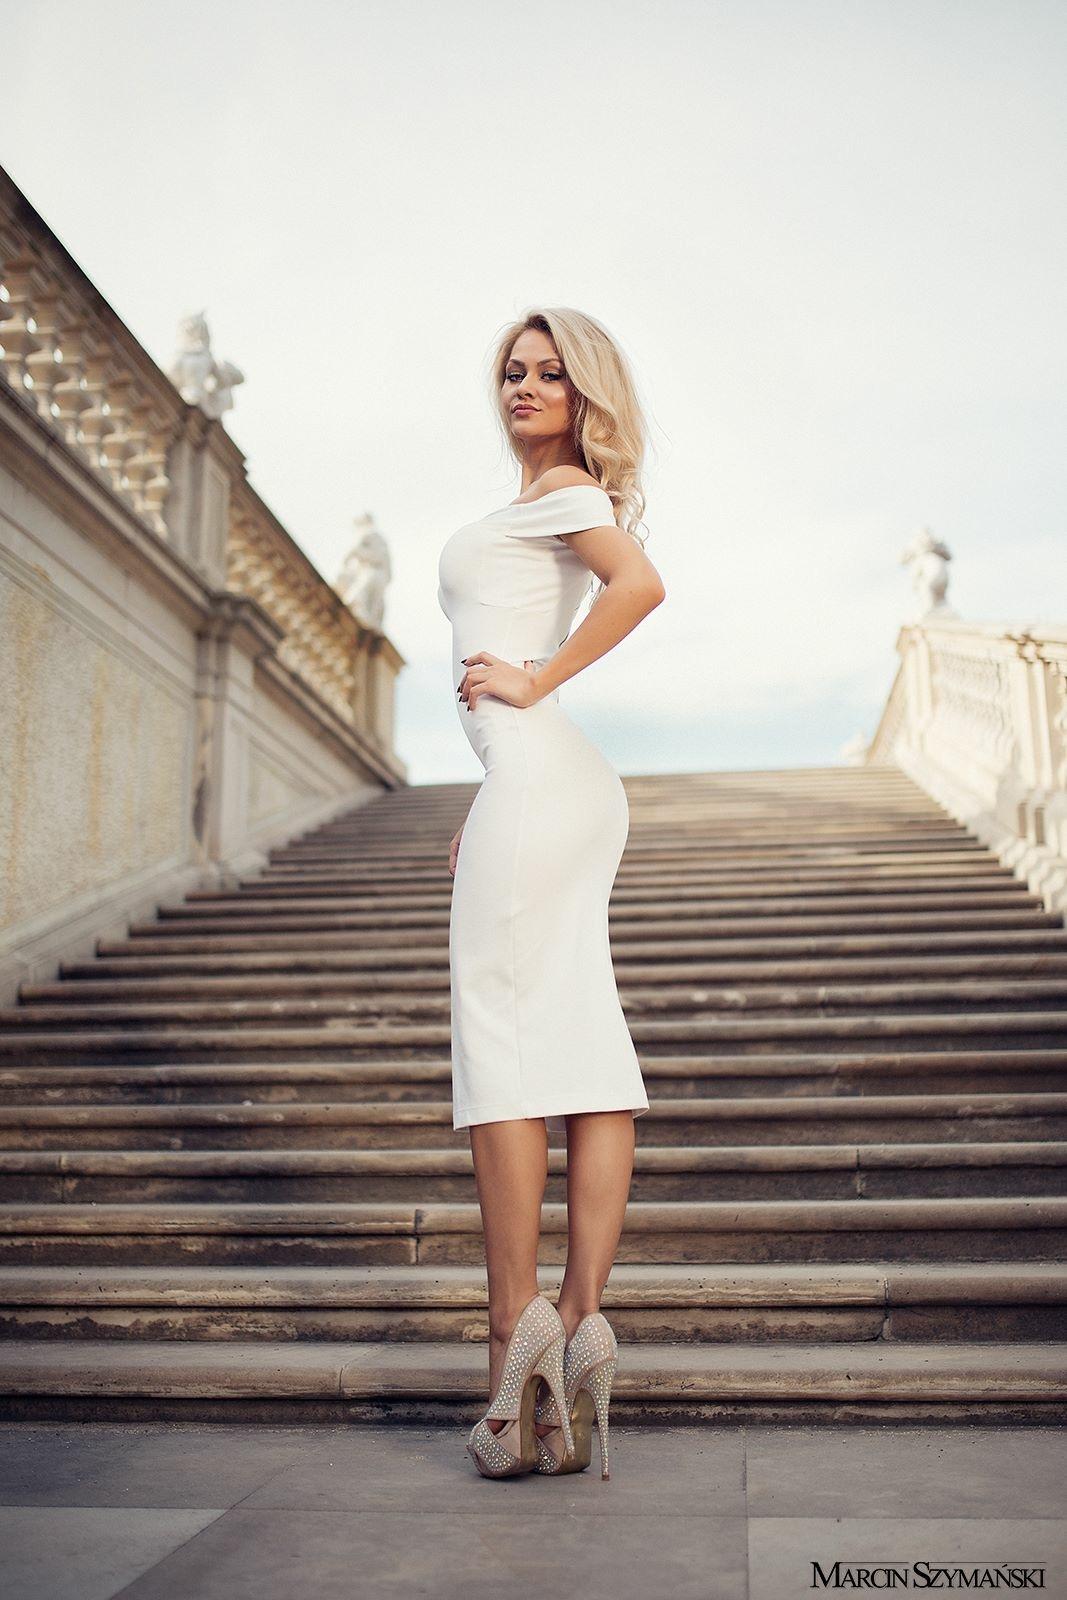 Marta Rusak - Konkurs Dziewczyna RMF 4RACING Team 2017